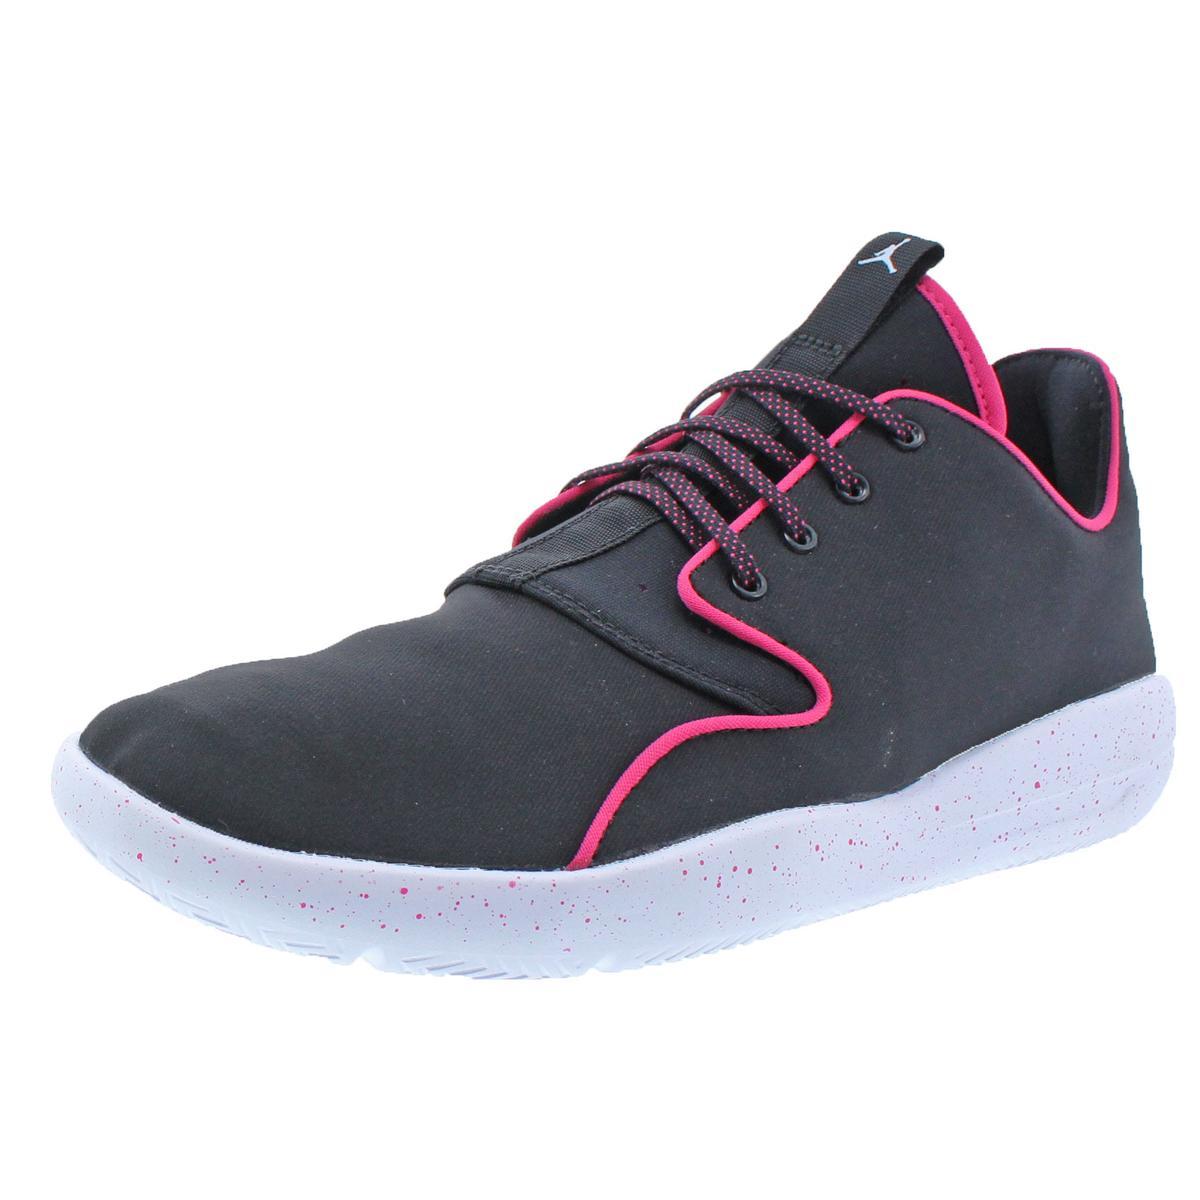 Details about Jordan Girls Black Fashion Sneakers Shoes 7 Medium (B 811abd99d